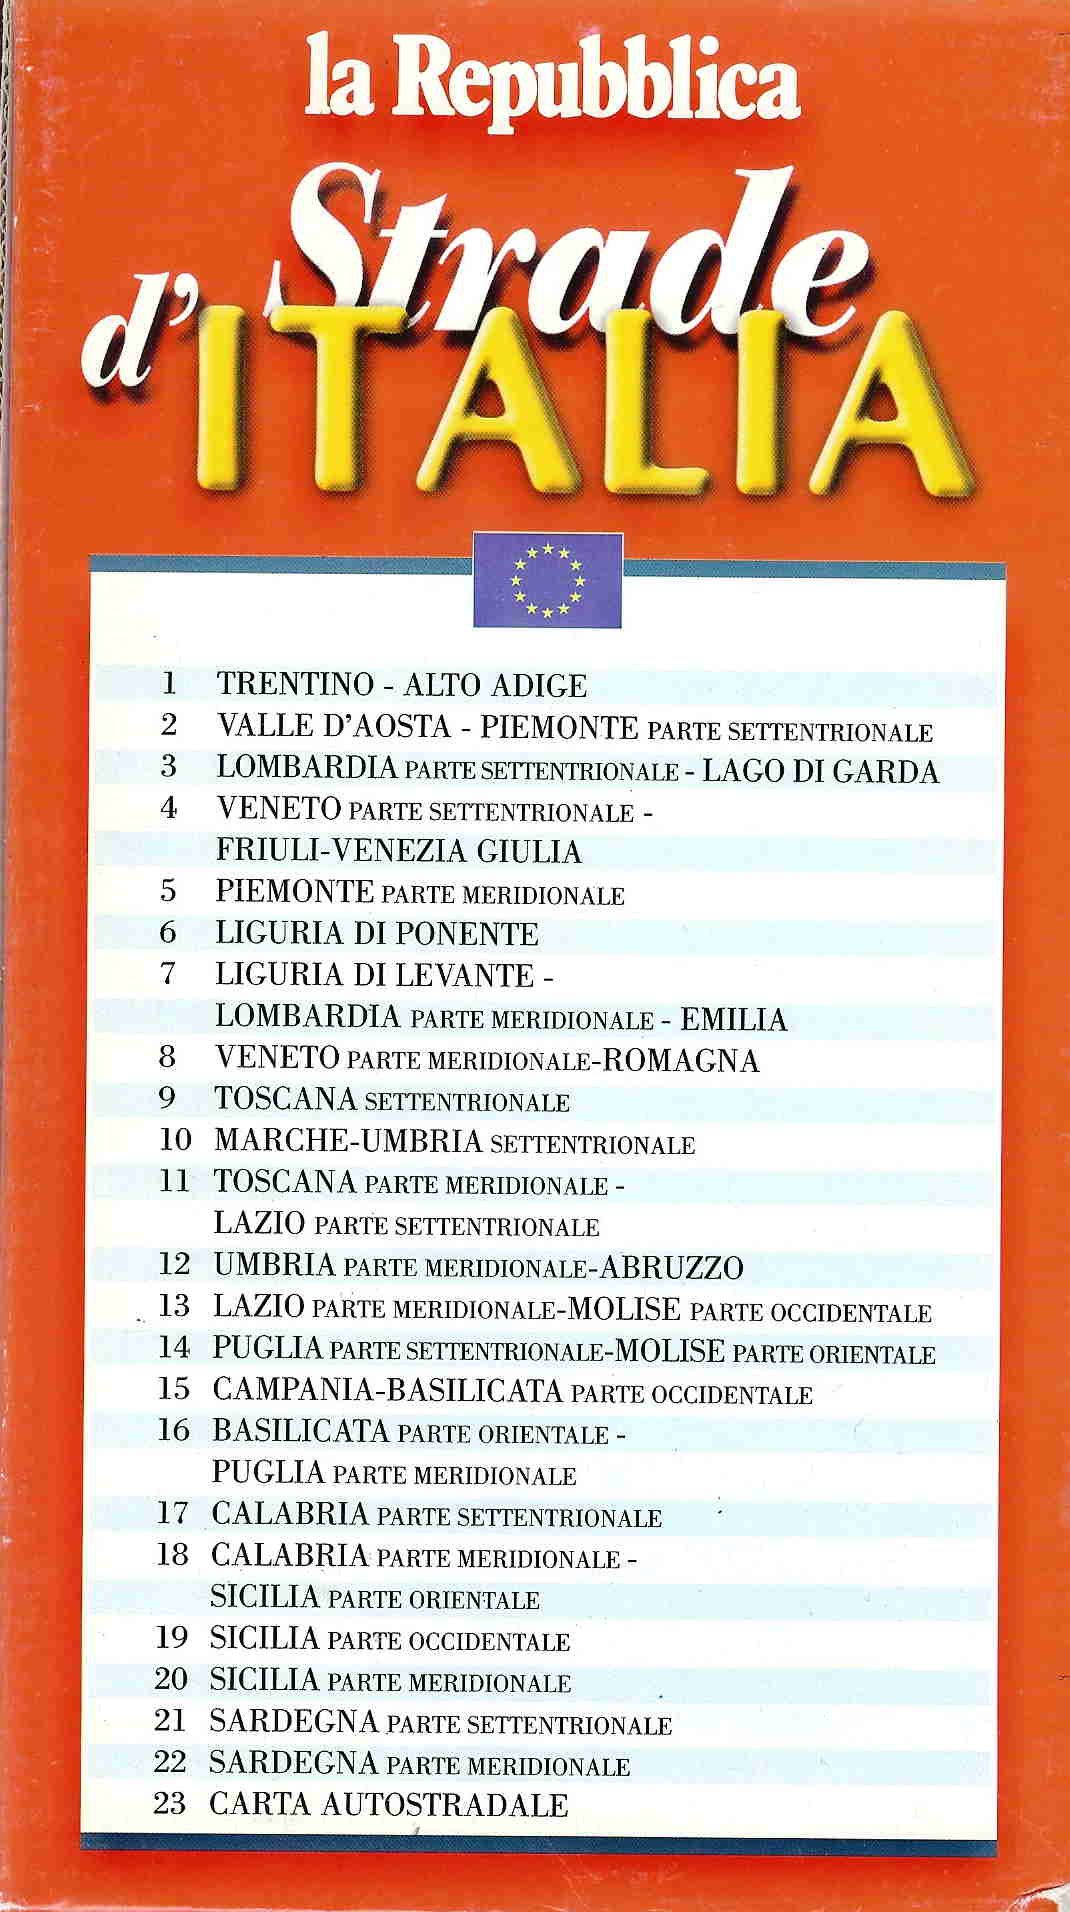 Strade d'Italia